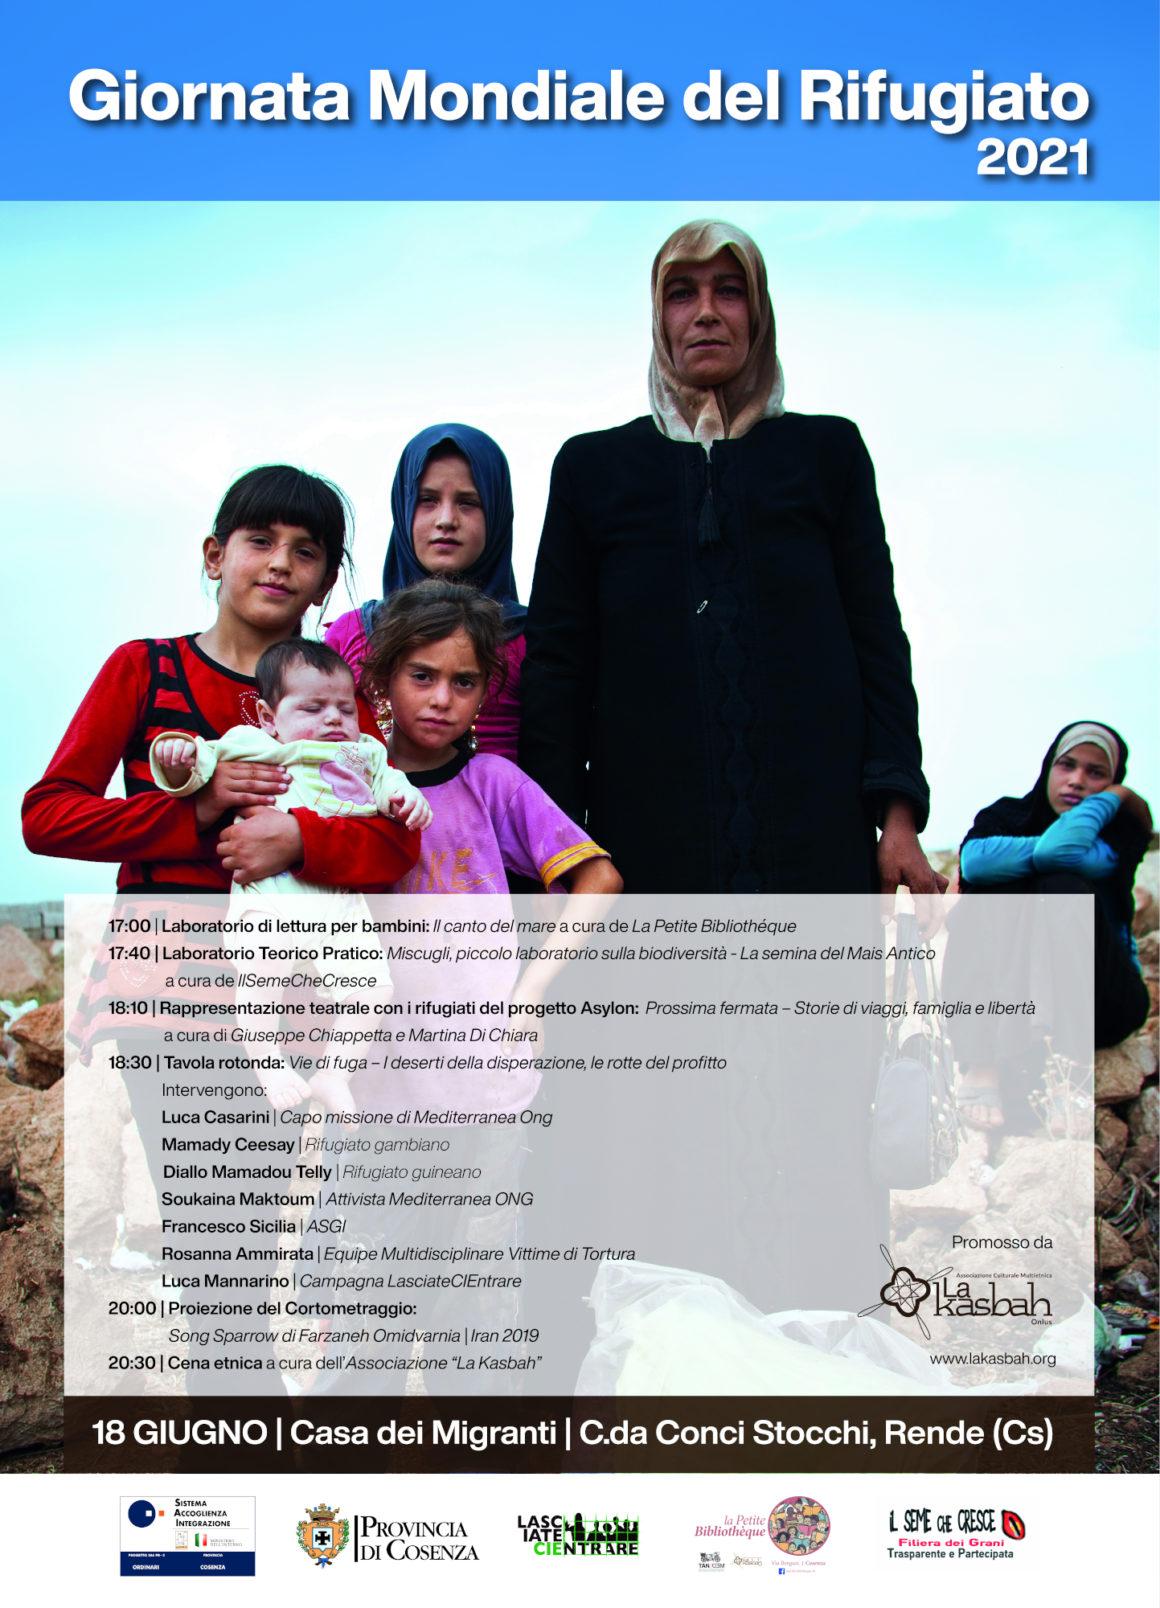 Giornata Mondiale del Rifugiato 2021